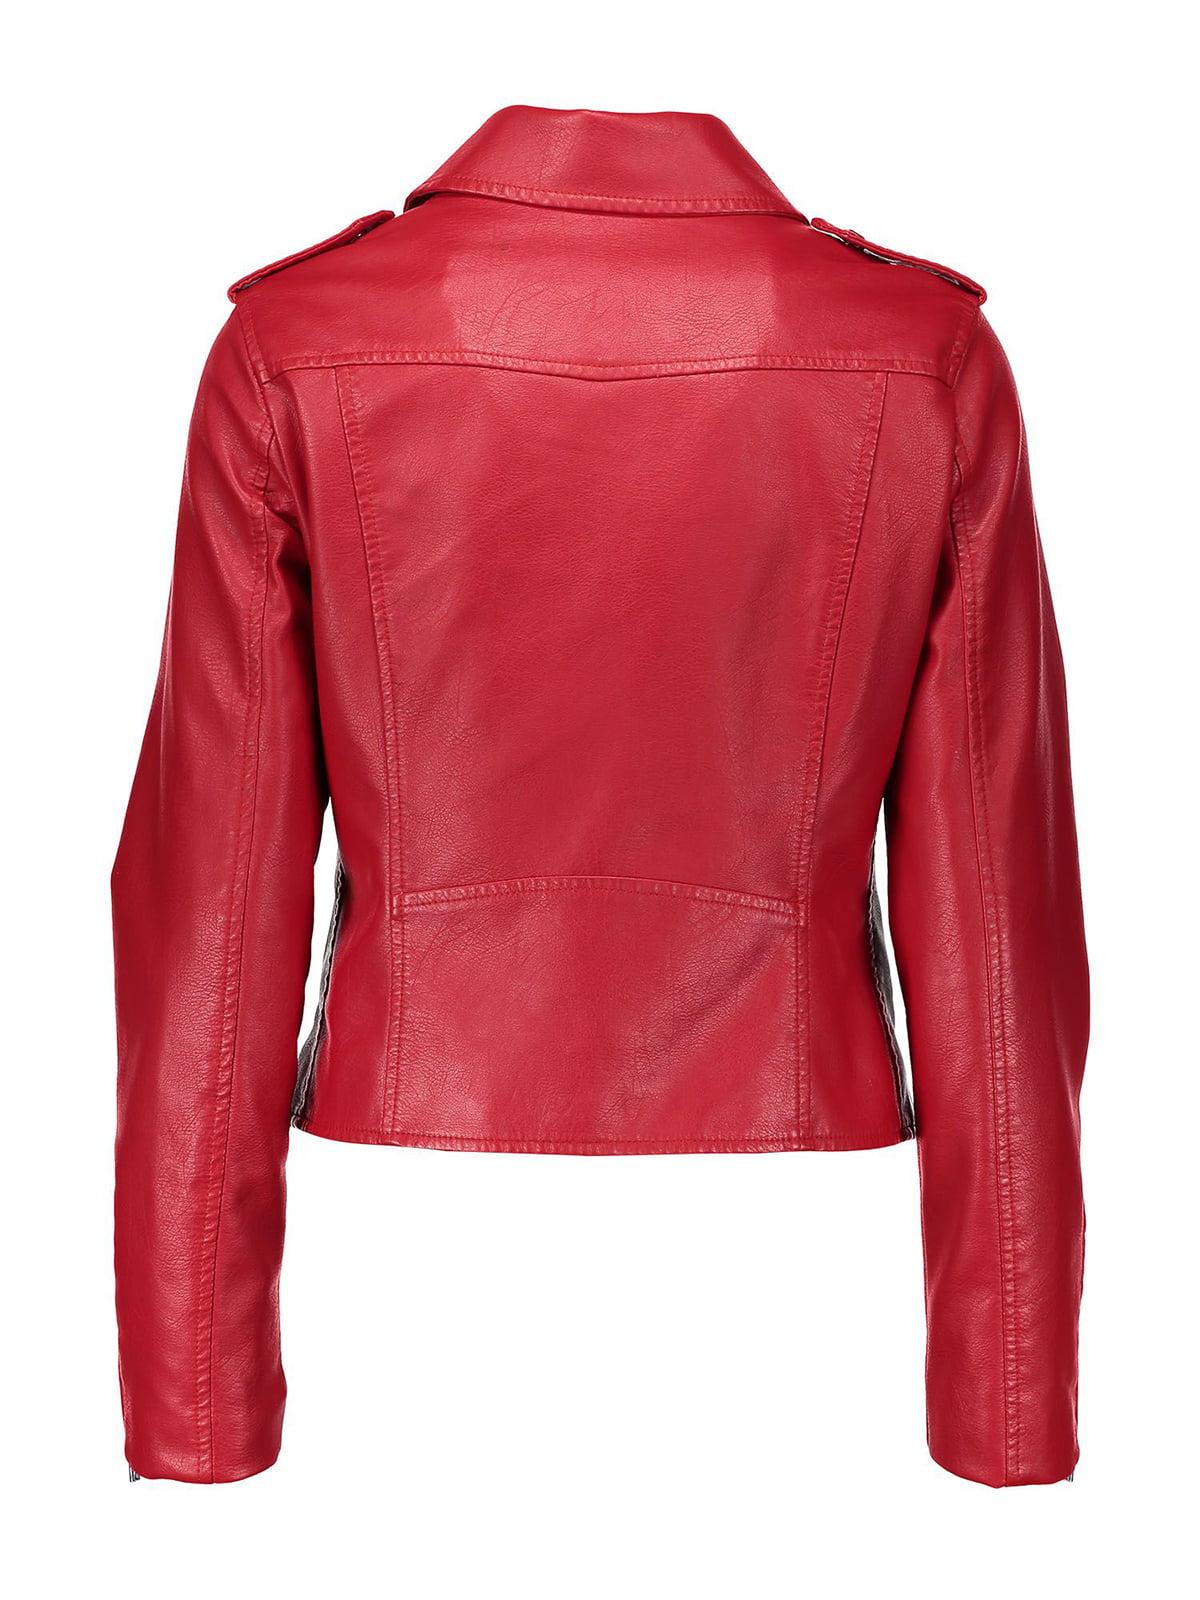 Куртка червона | 4909359 | фото 2